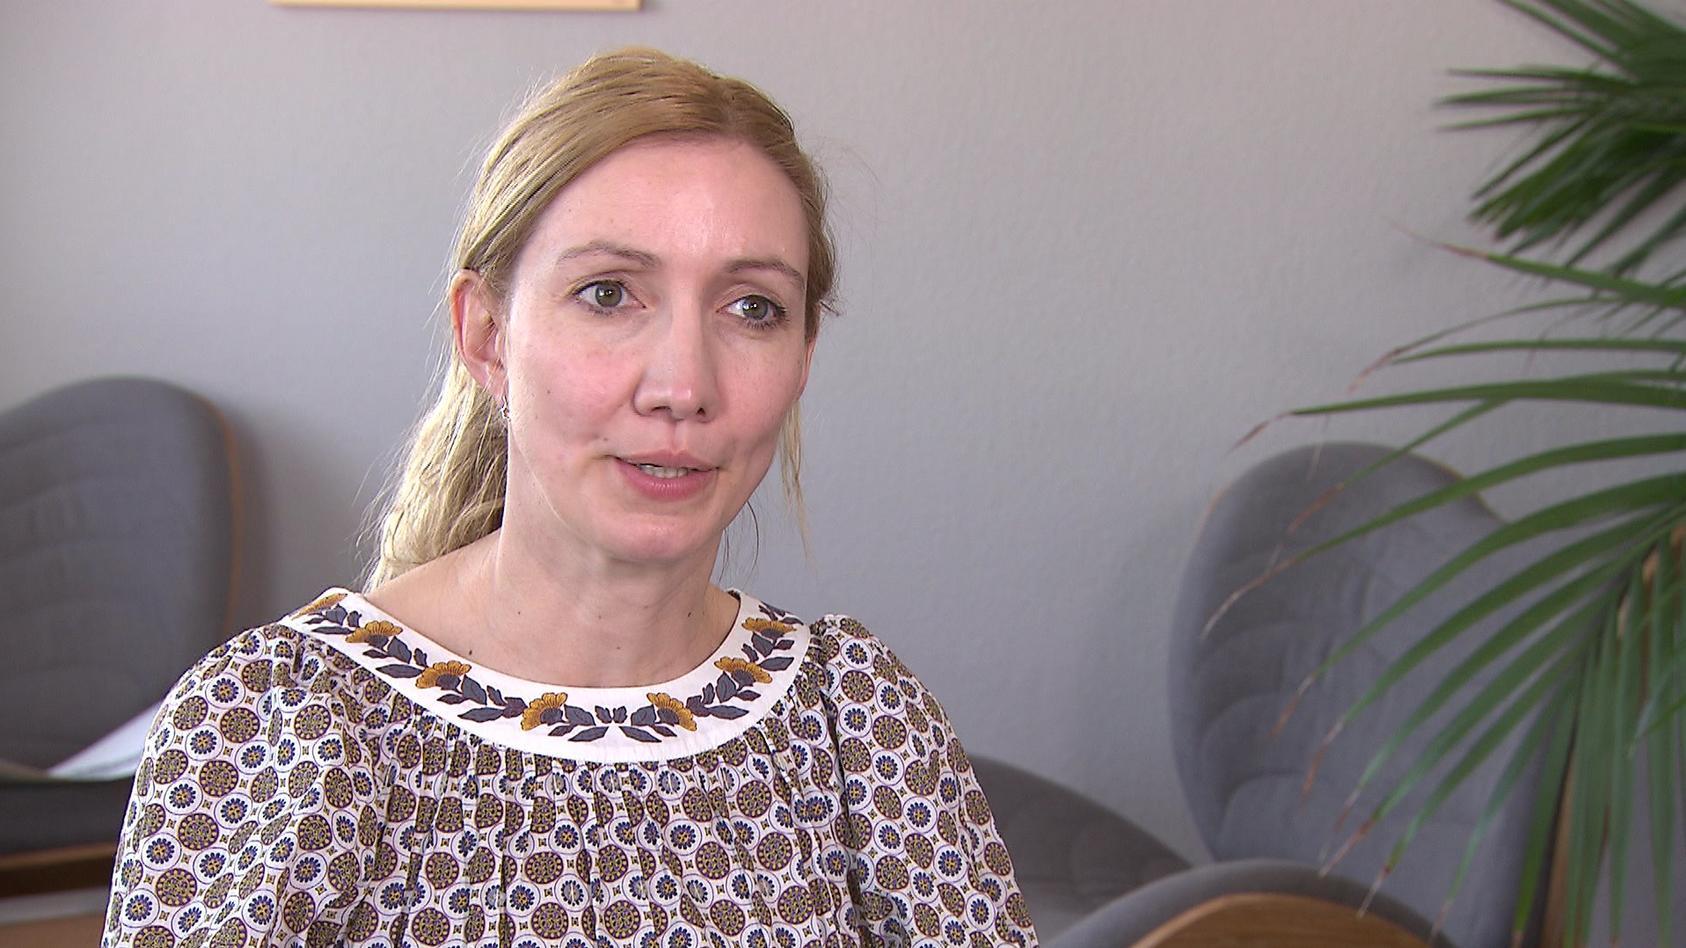 Virologin Sandra Ciesek im RTL-Interview